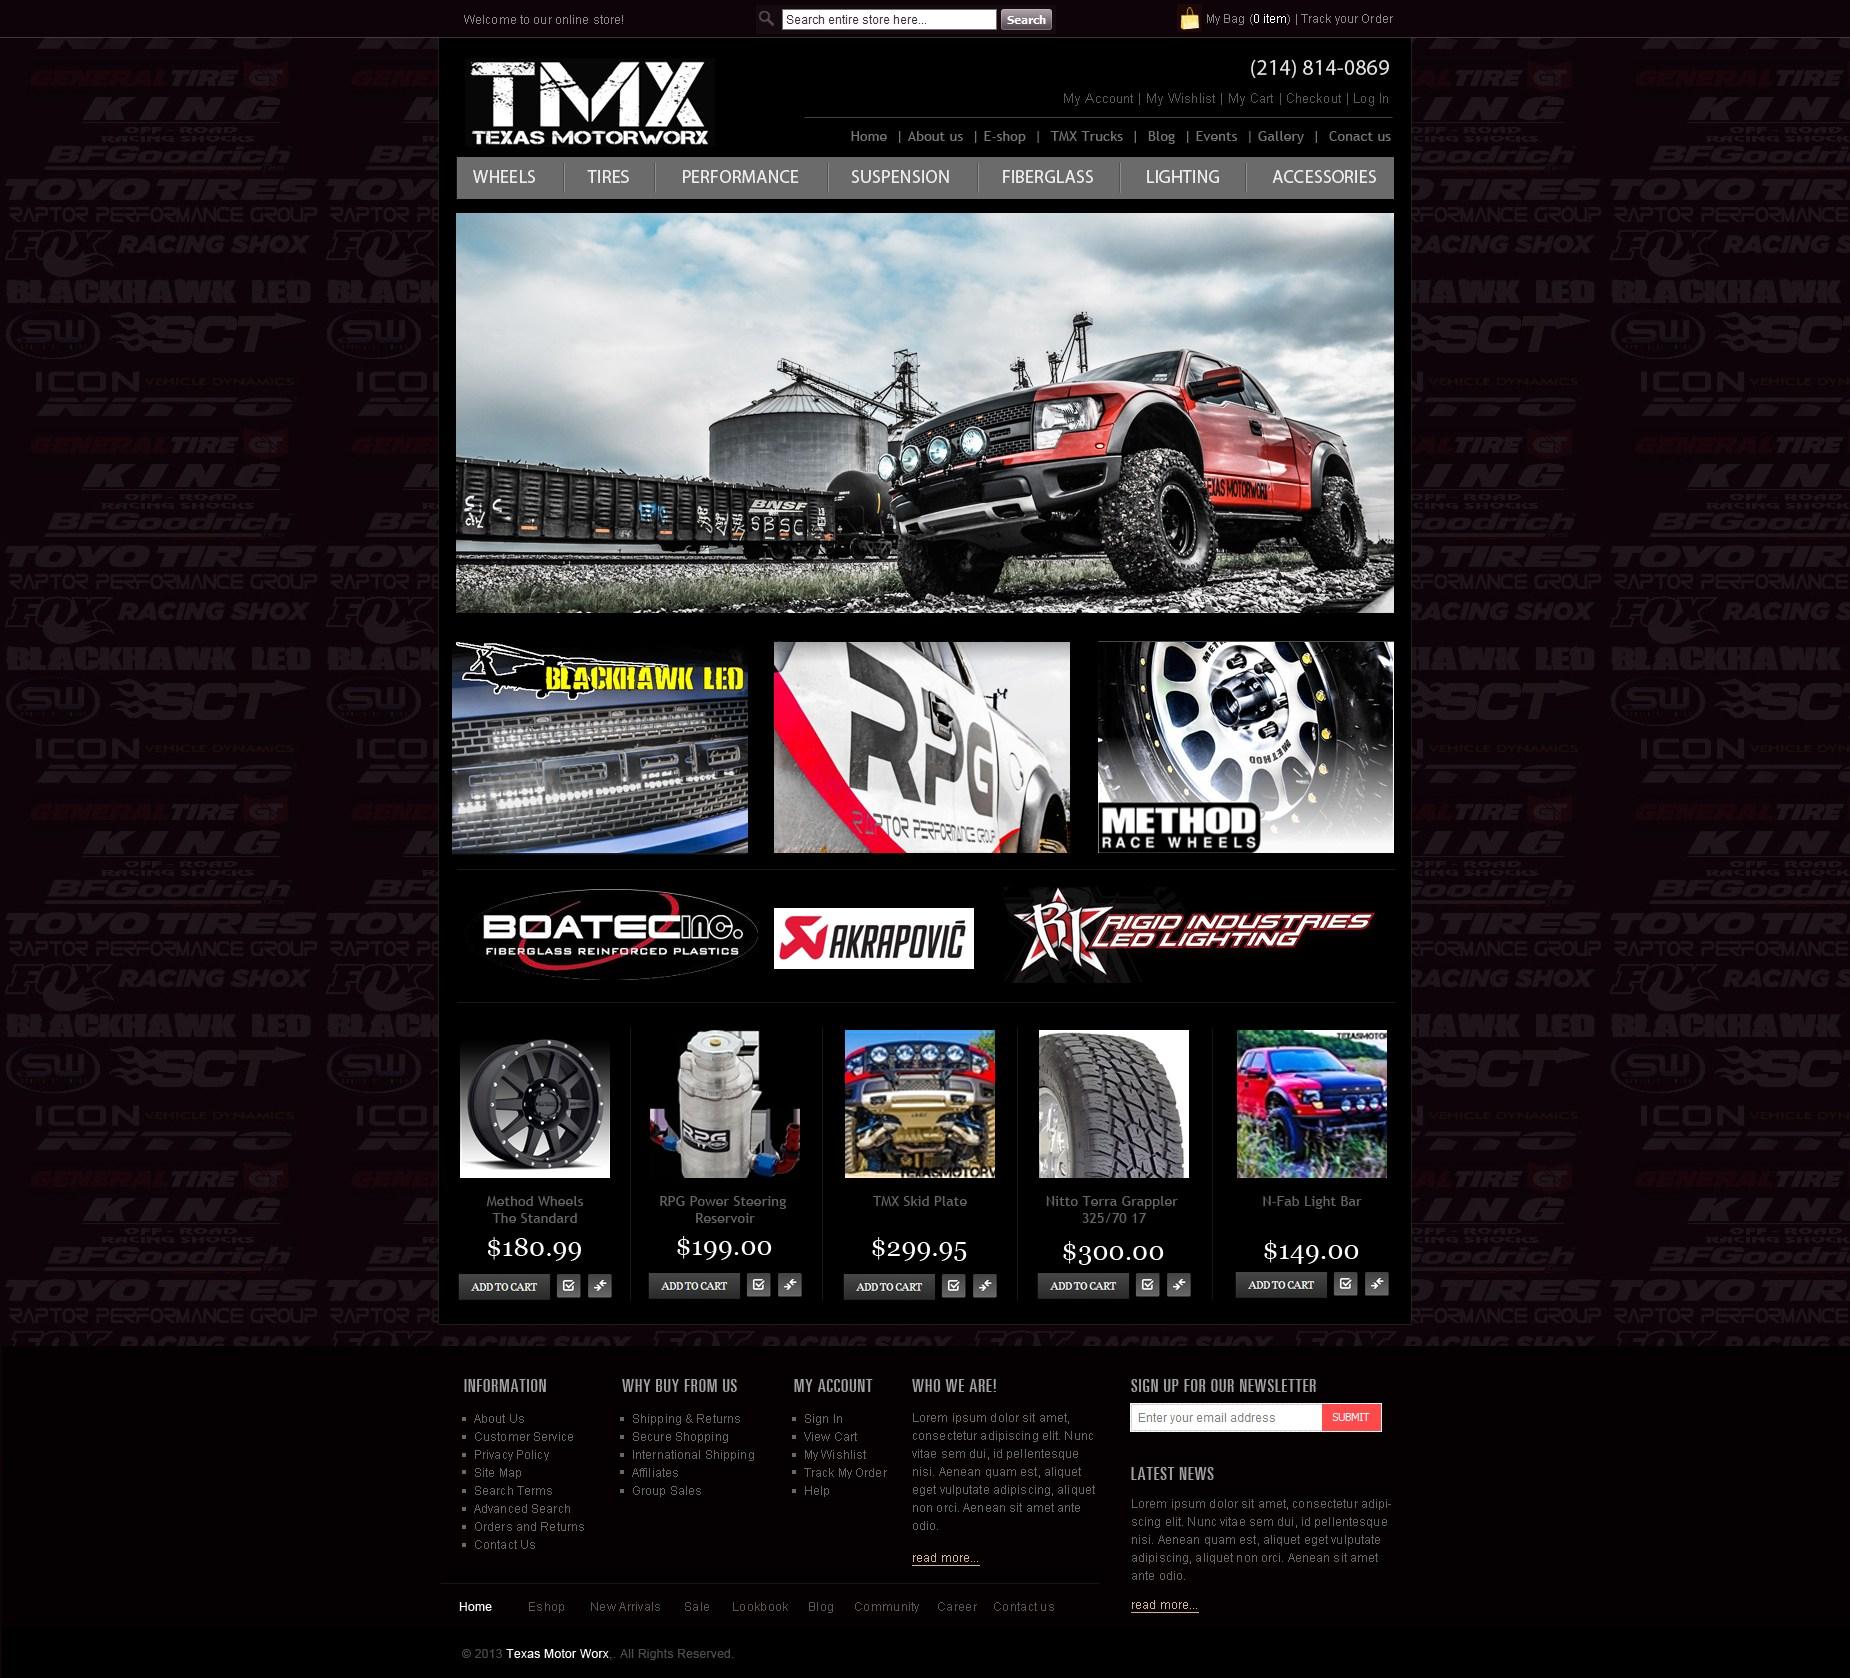 Texas MotorWorx